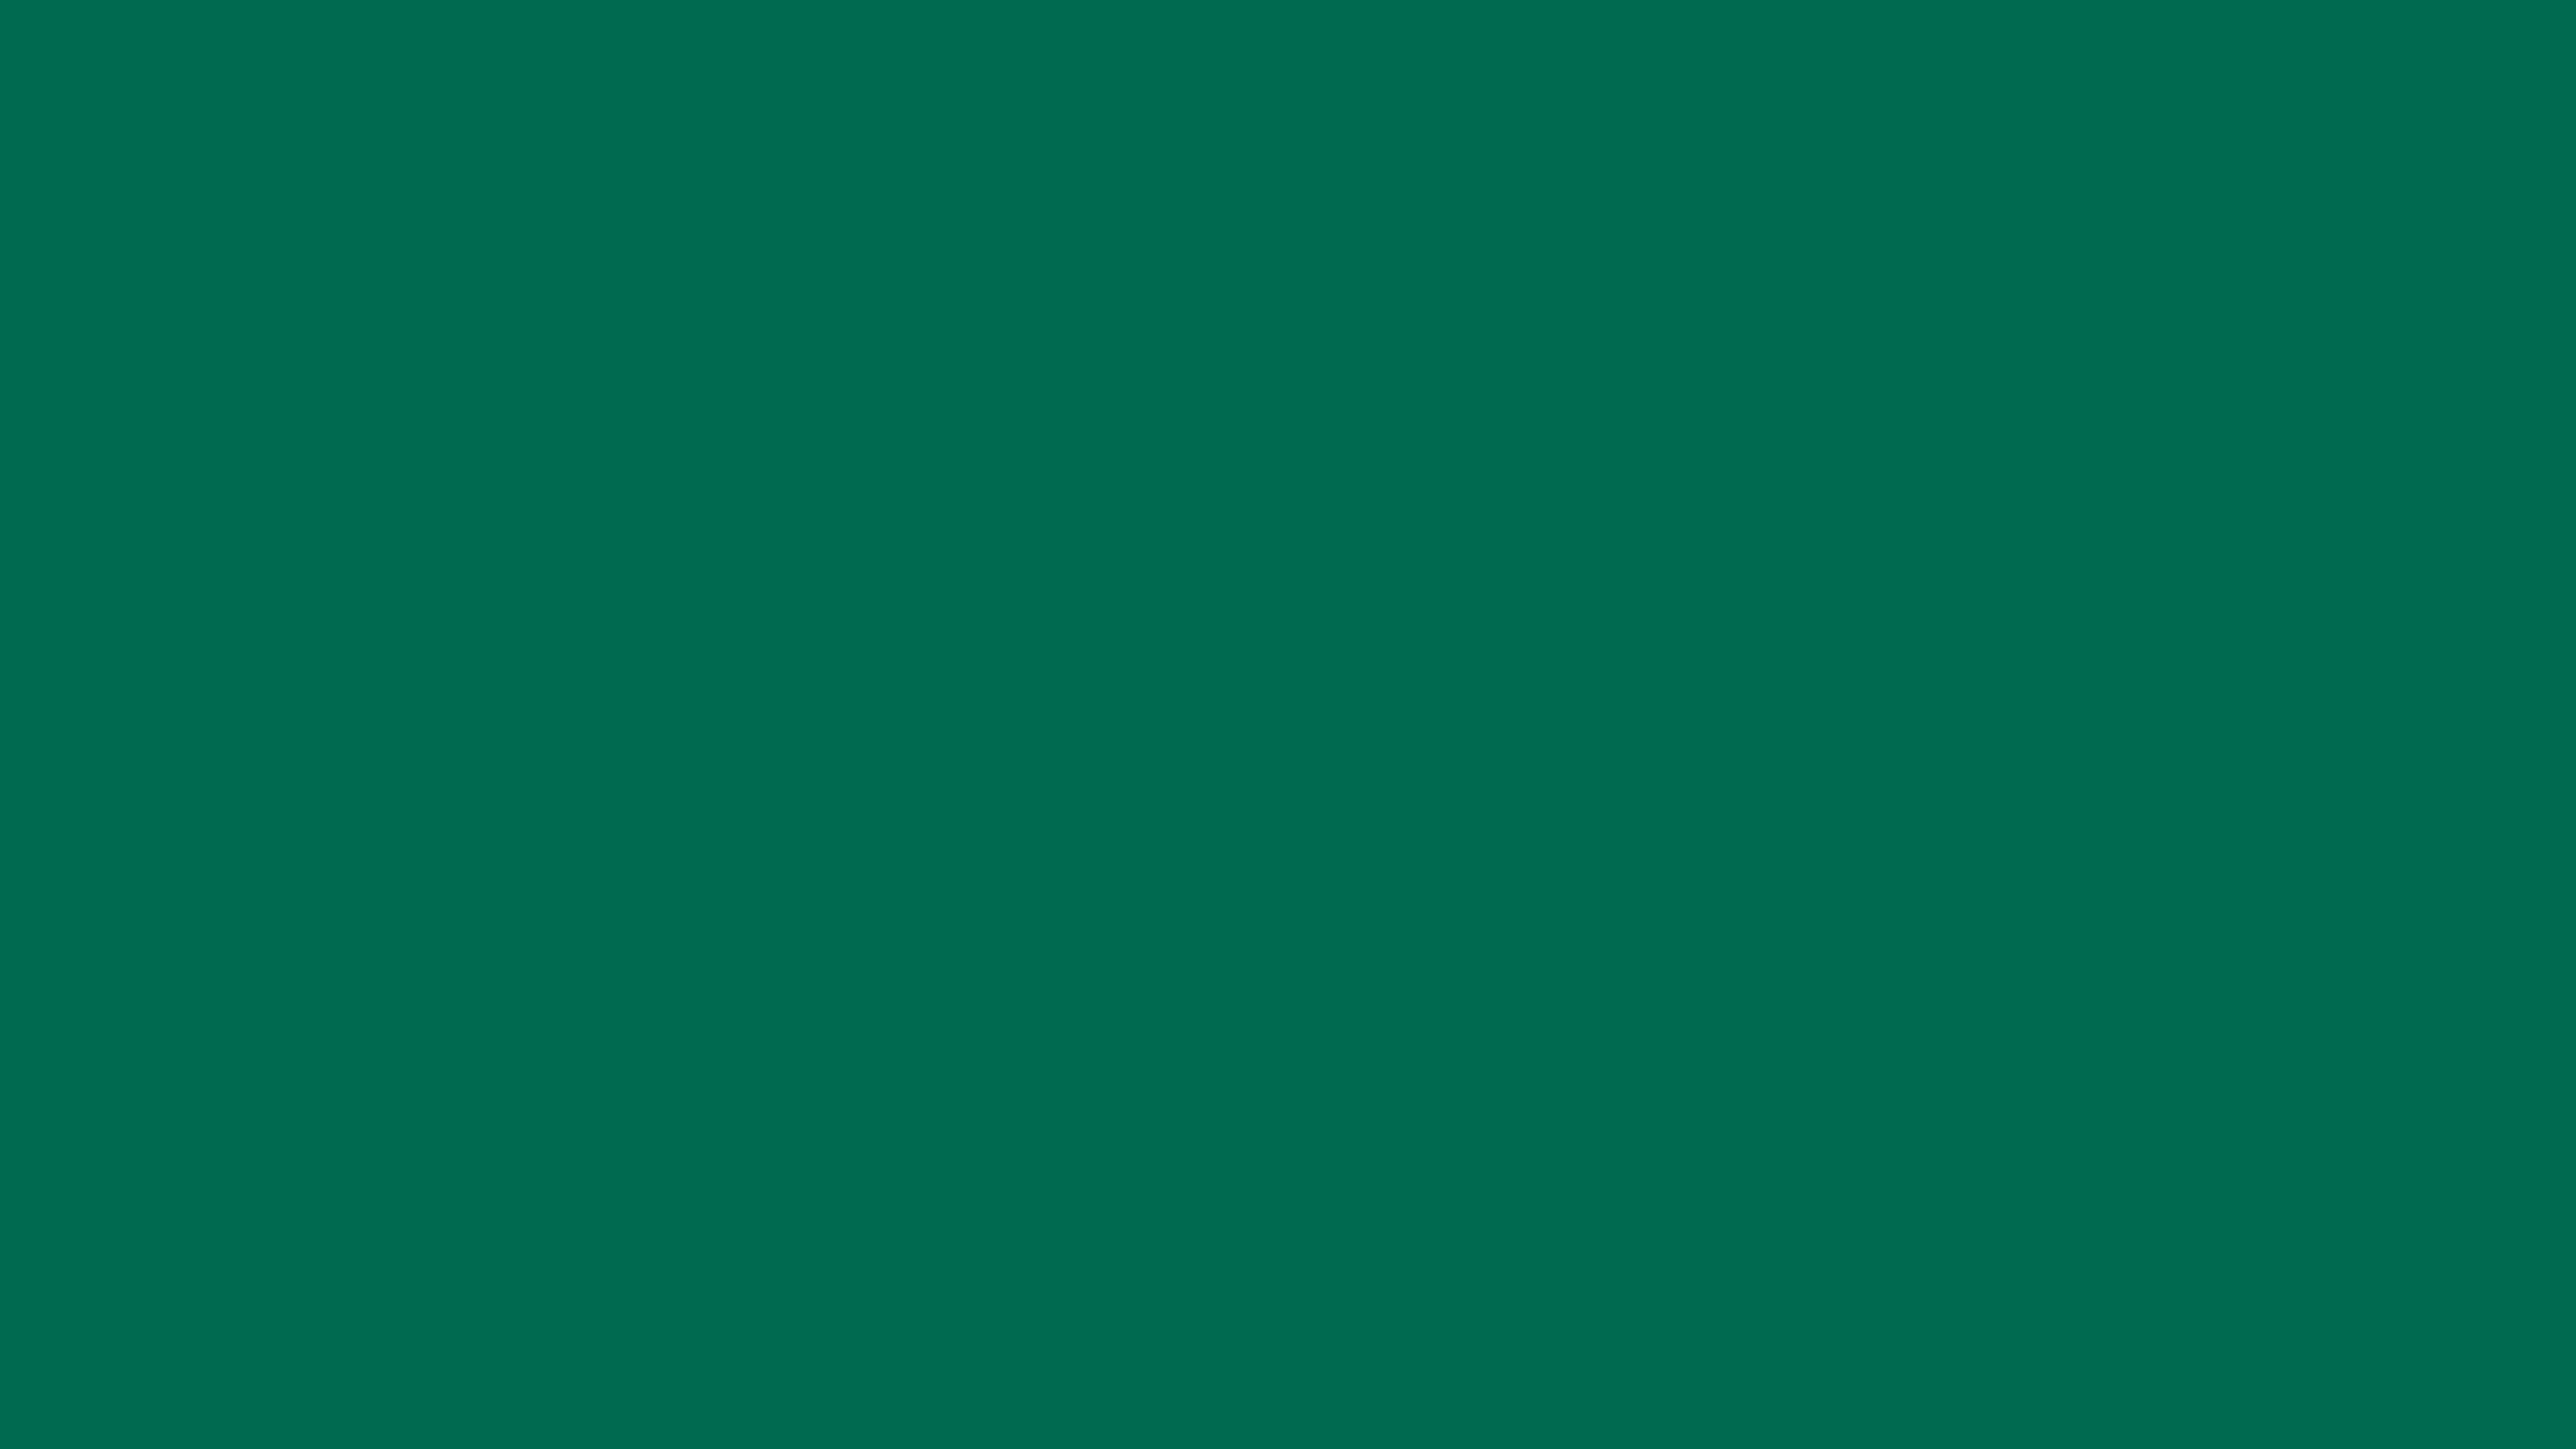 7680x4320 Bottle Green Solid Color Background